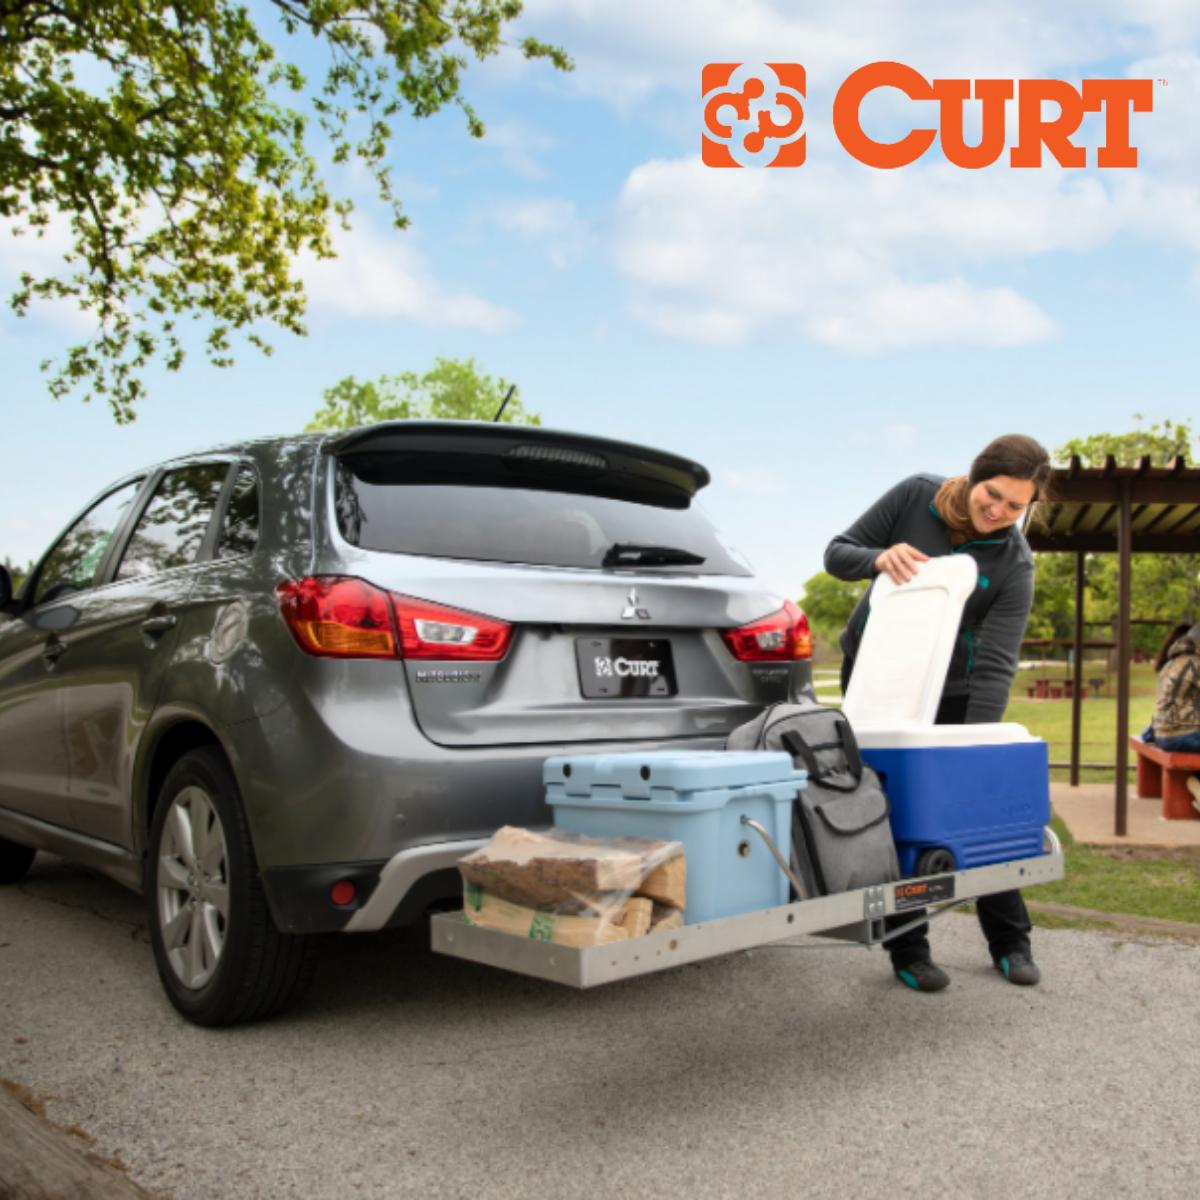 CURT's Cargo Carrier